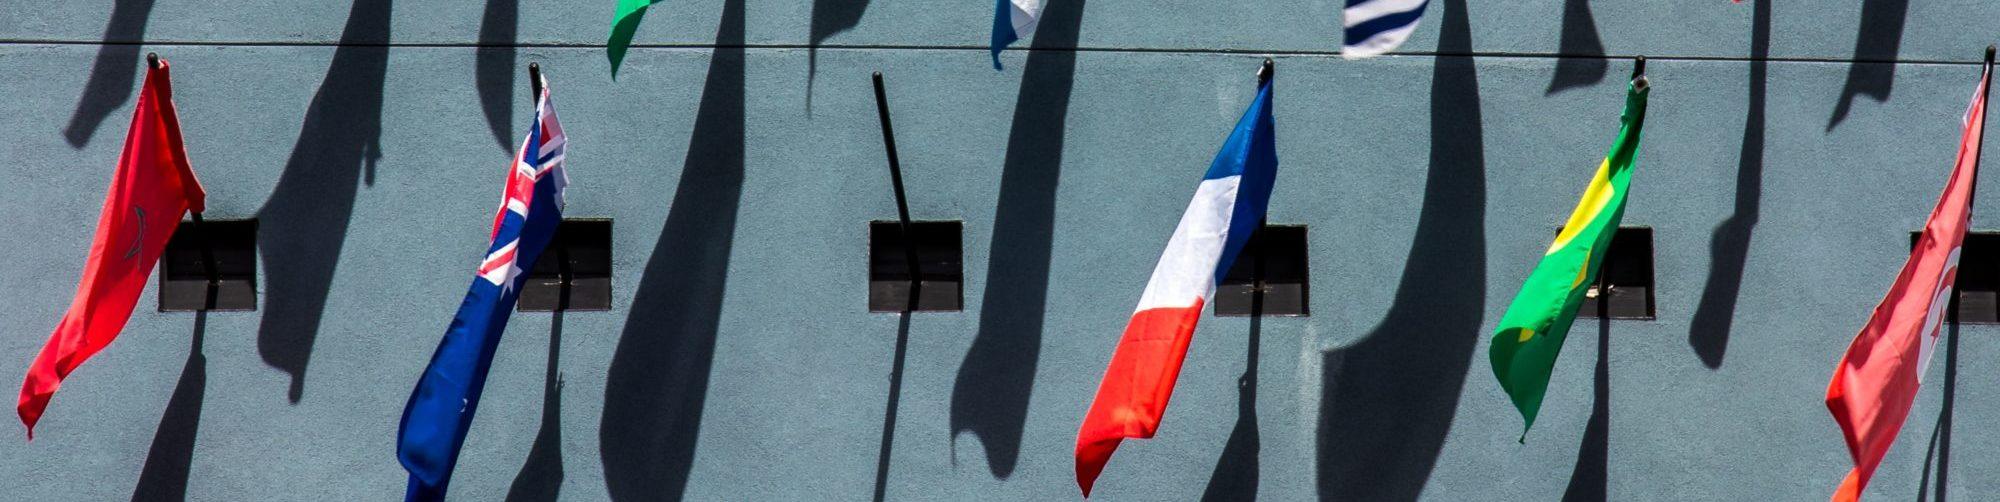 drapeaux internationaux au chateau Vaillant internat college lycee esport